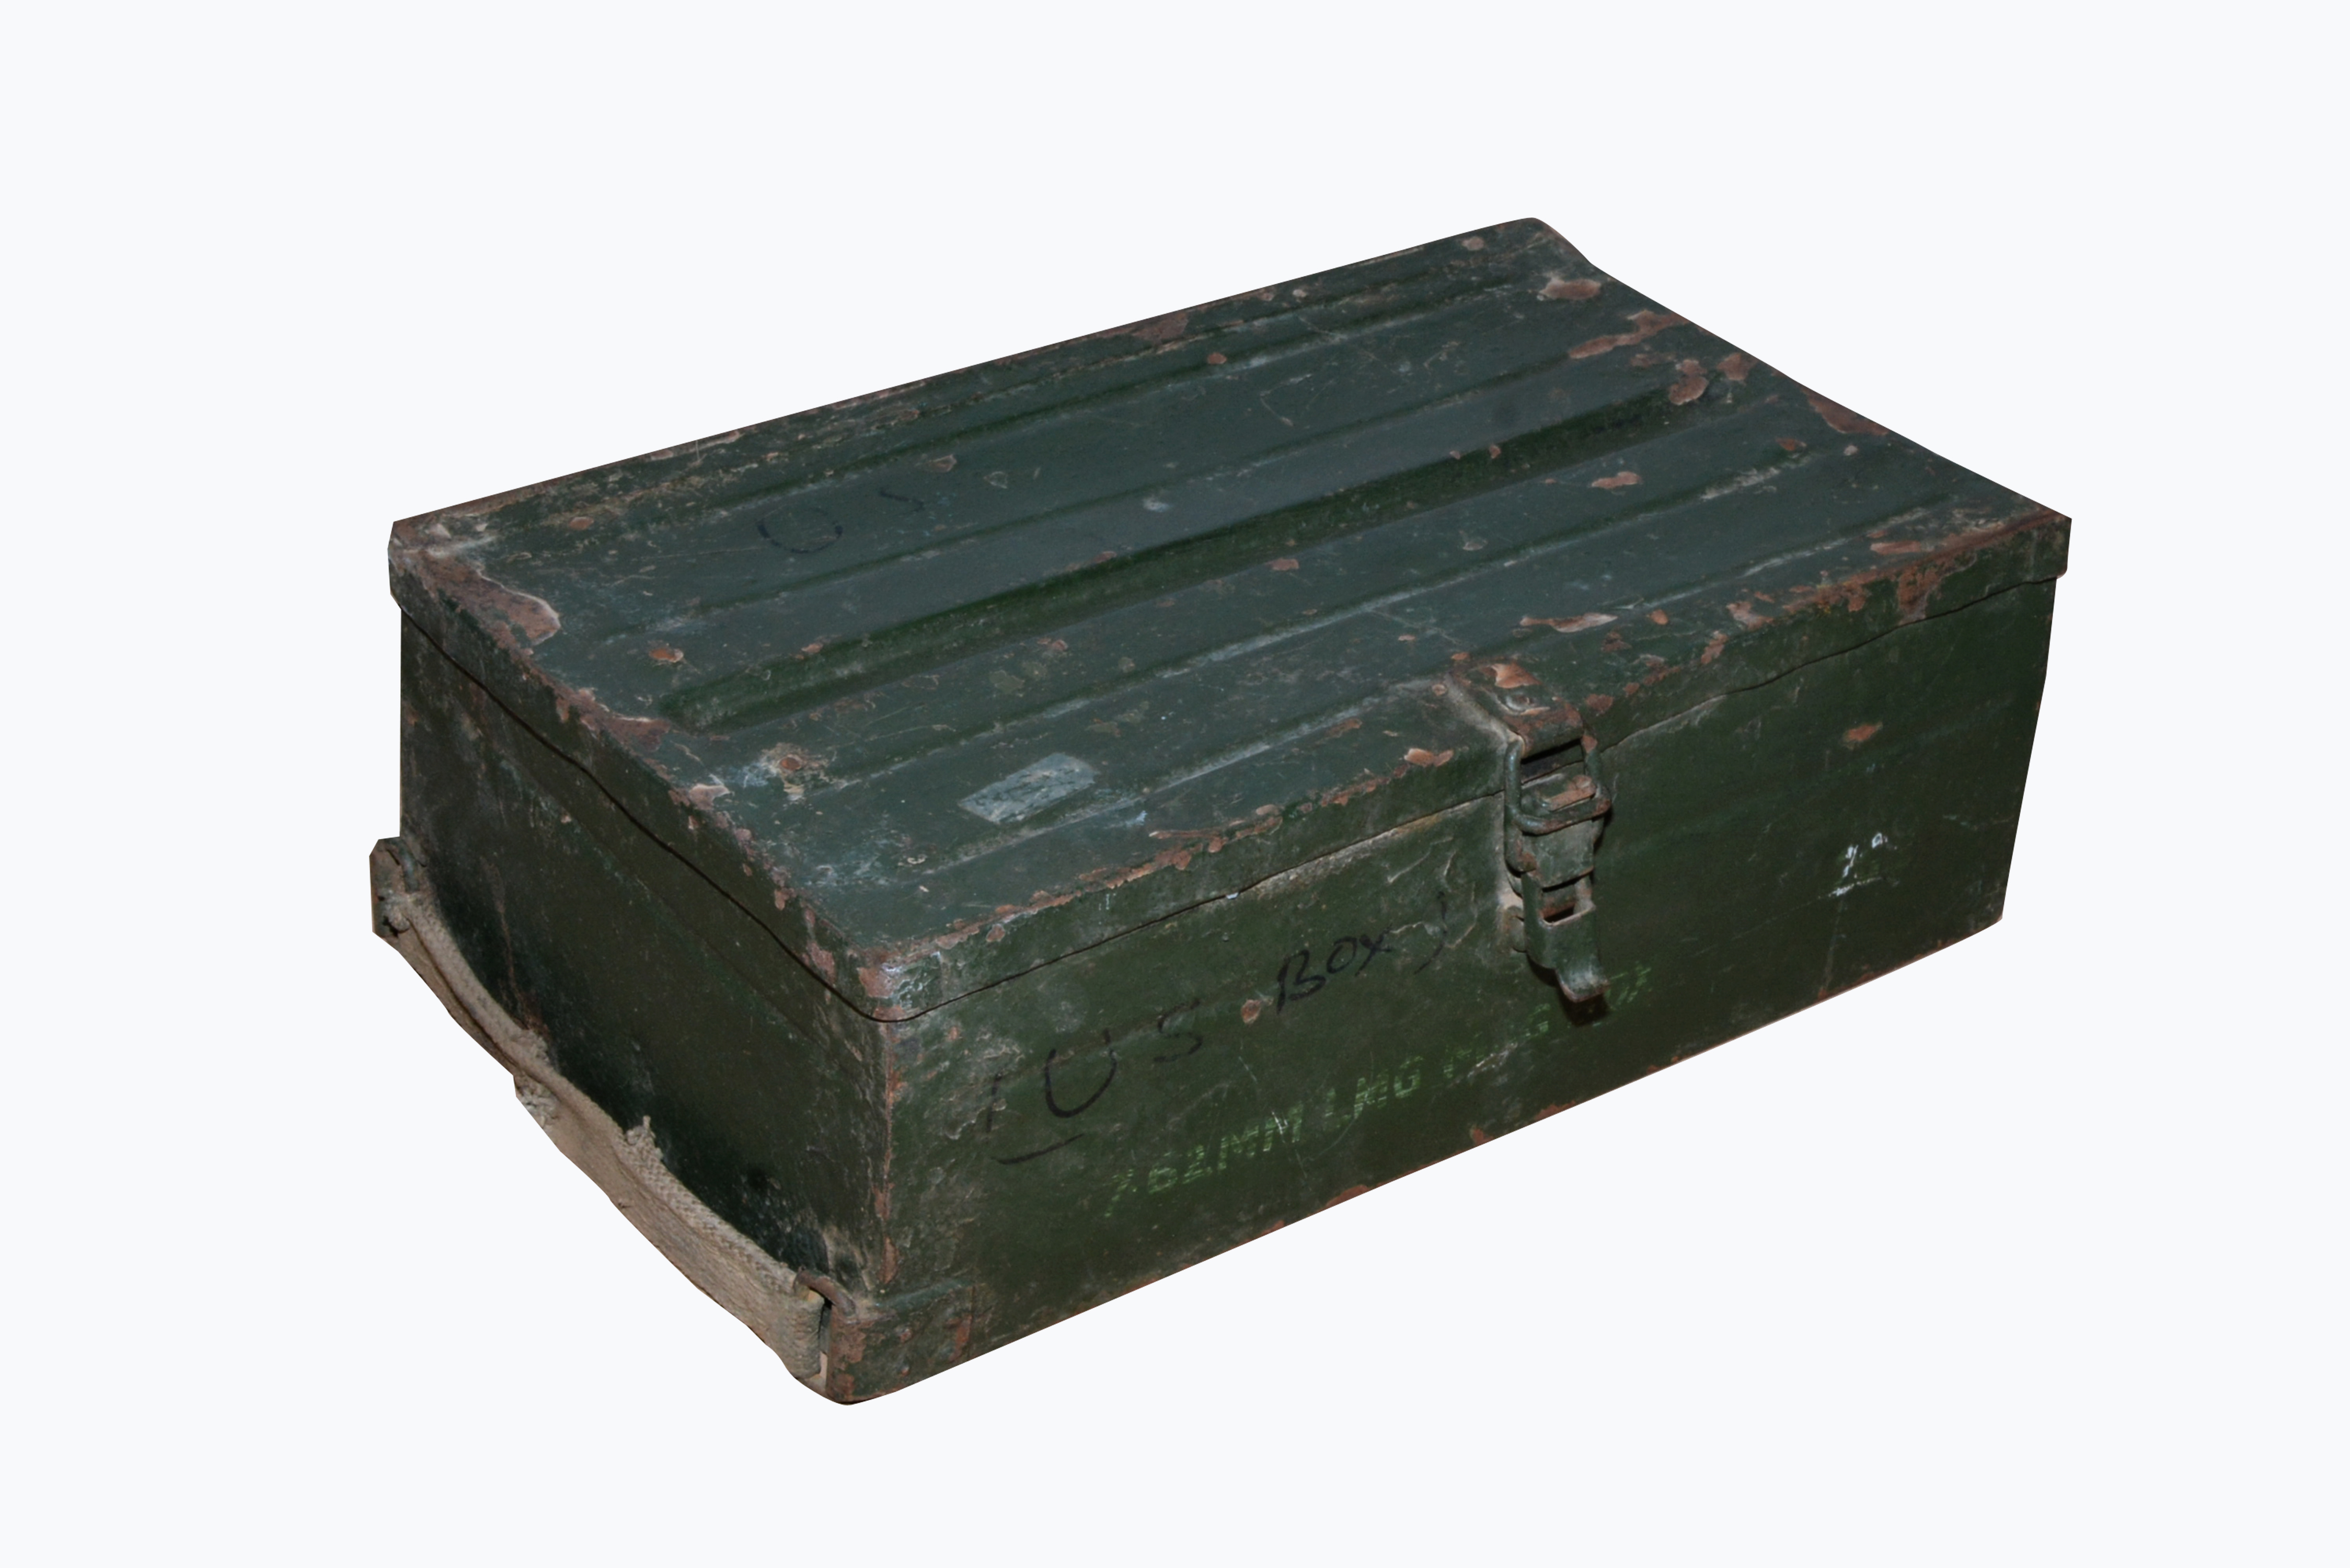 ANRA1787 40 x 25 x 14 cm